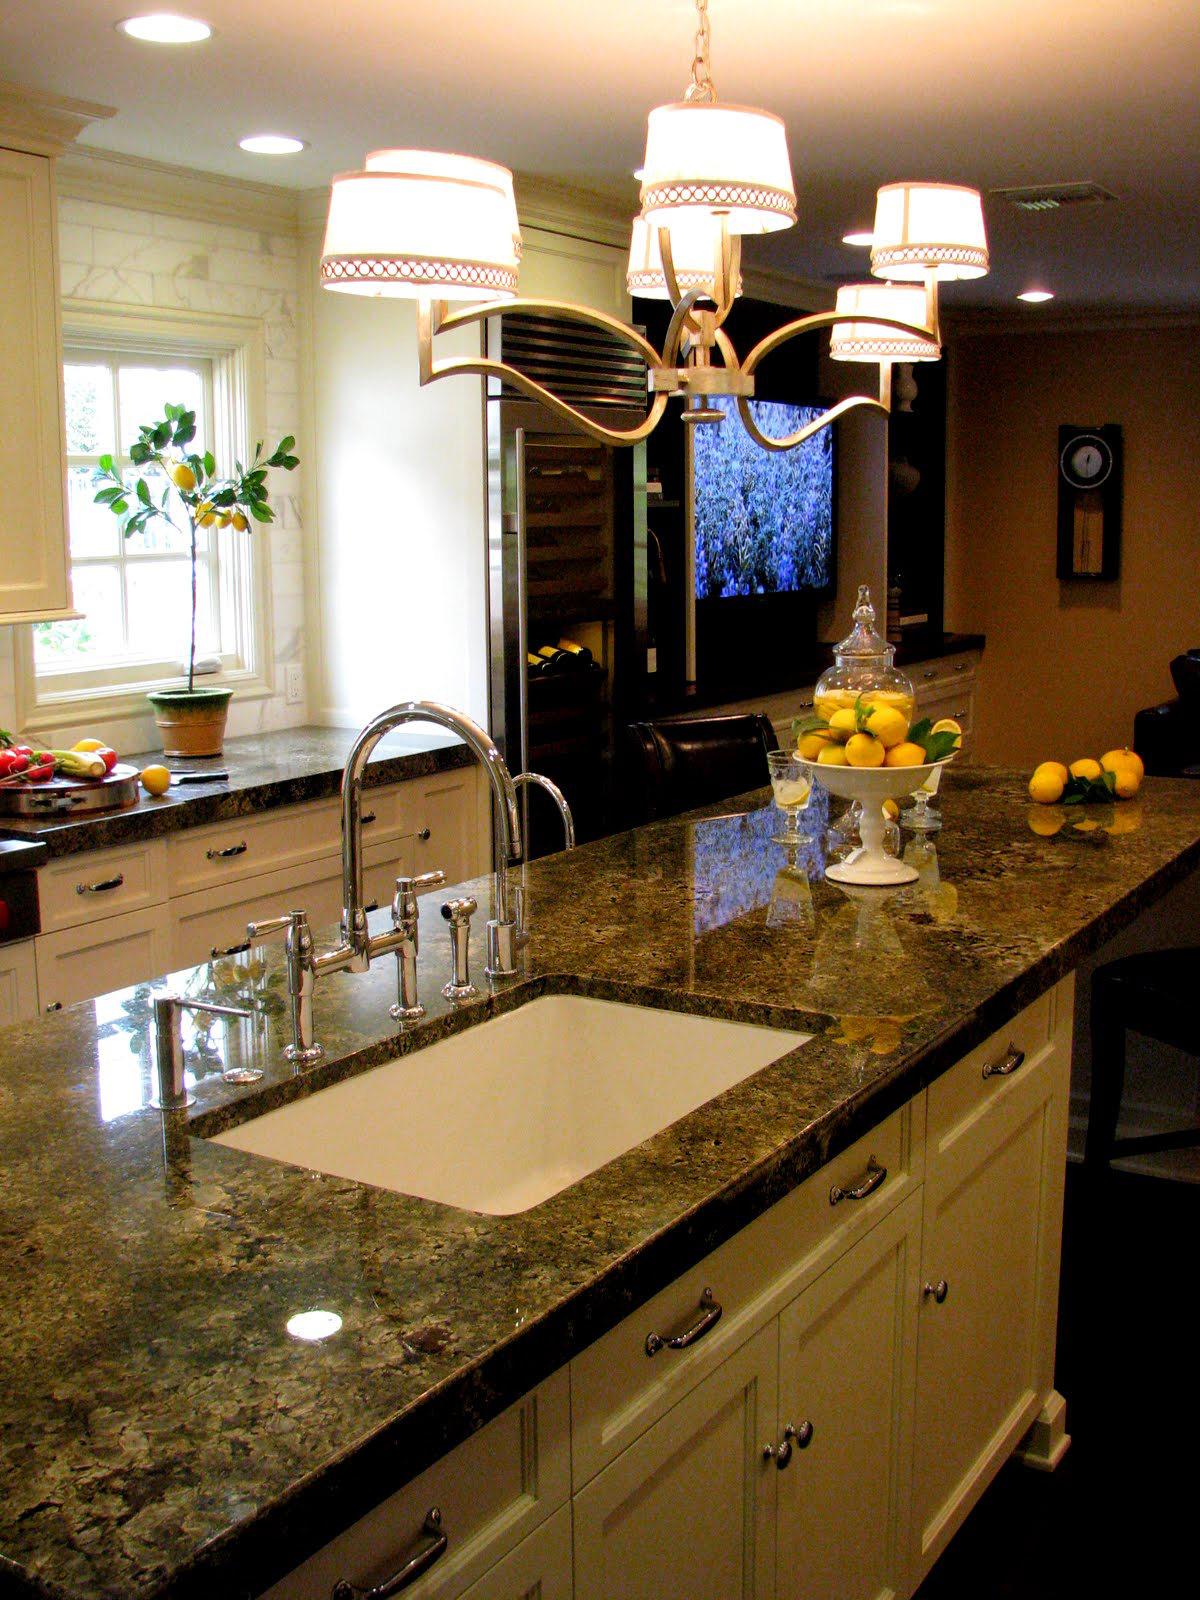 beverlywood-california-kitchen-remodel-interior-design-montgomery-home.jpg